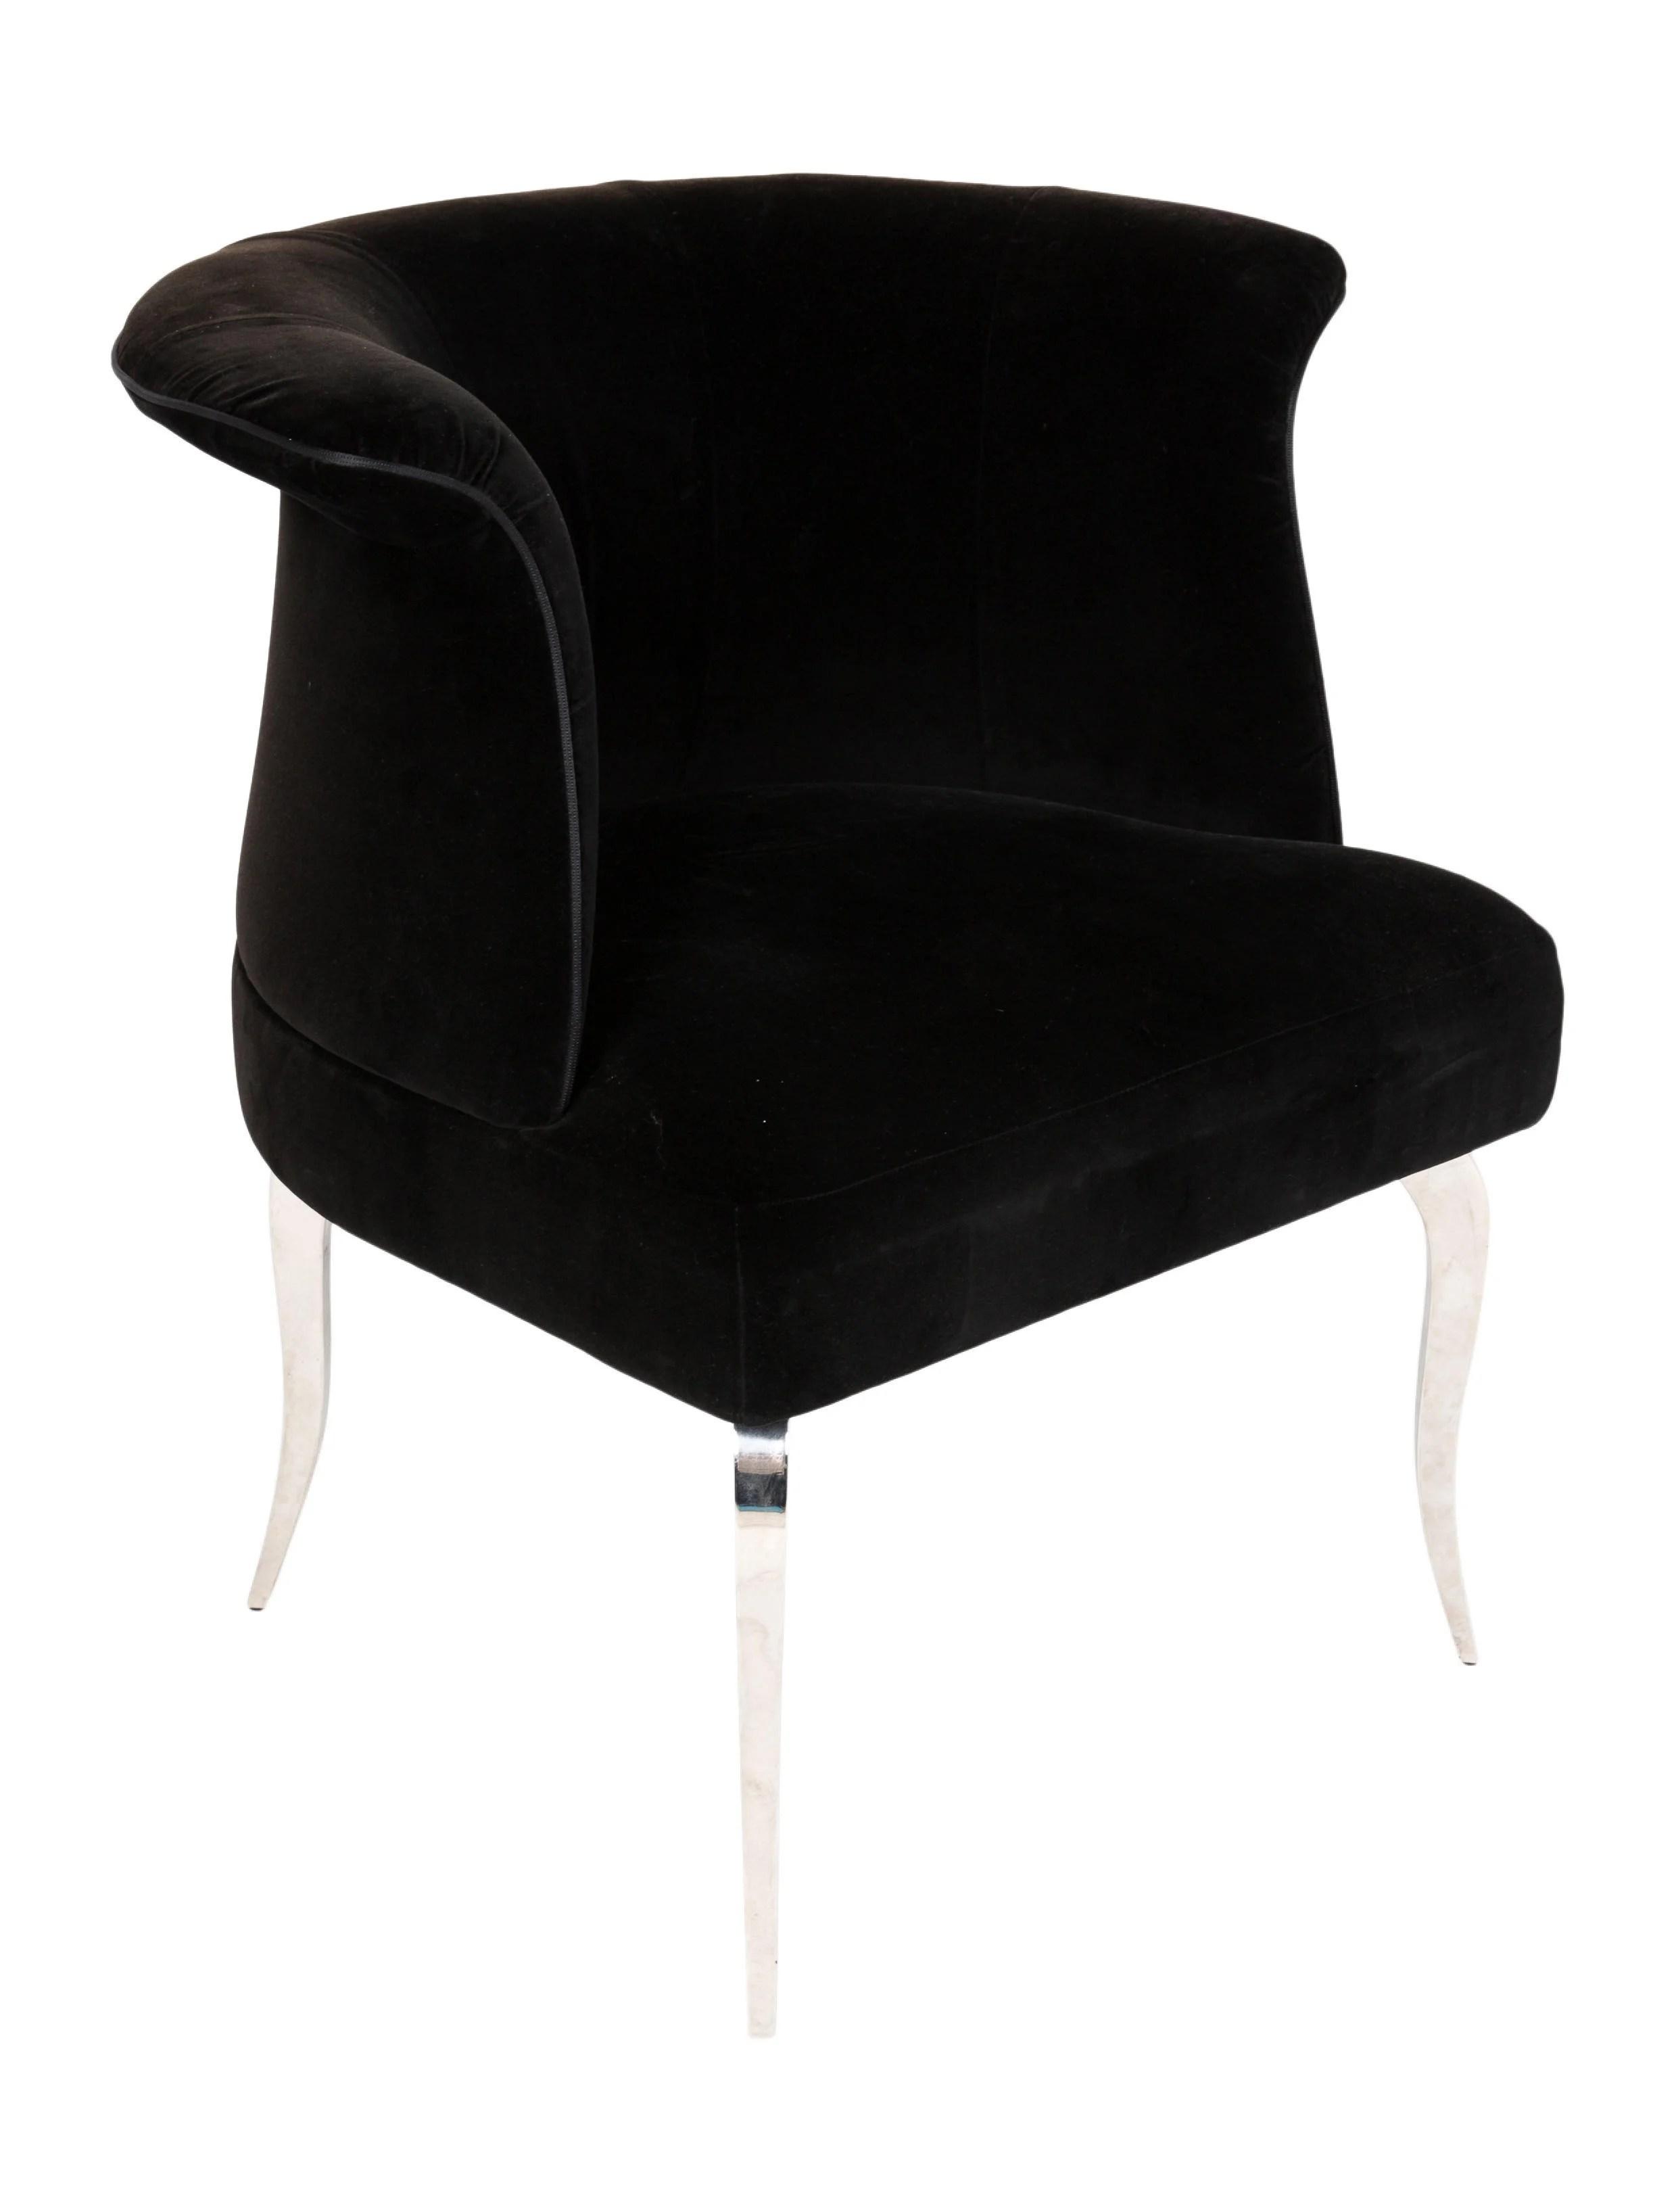 barrel back chair hanging egg with stand indoor fendi casa velvet furniture fcasa20002 the shop consign